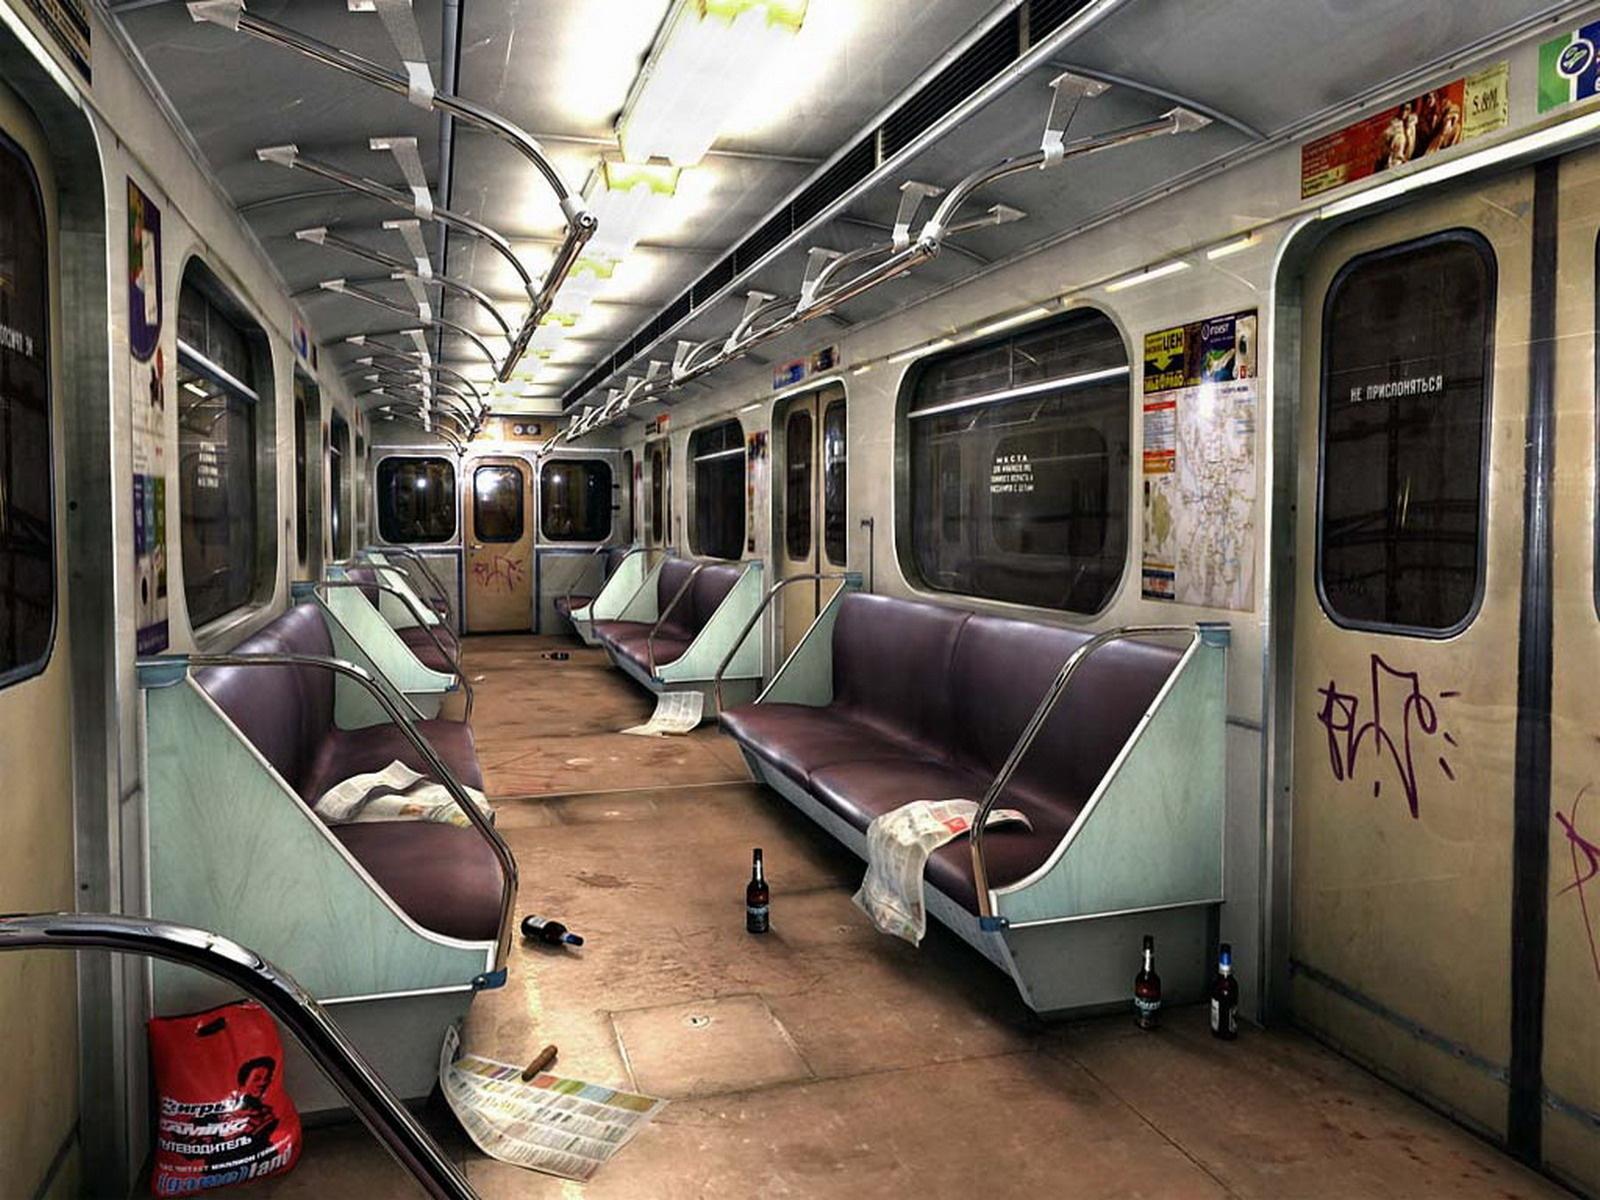 240531_metro_-metropoliten_-vagon_-besporyadok_-bardak_1600x1200_-www-getbg-net